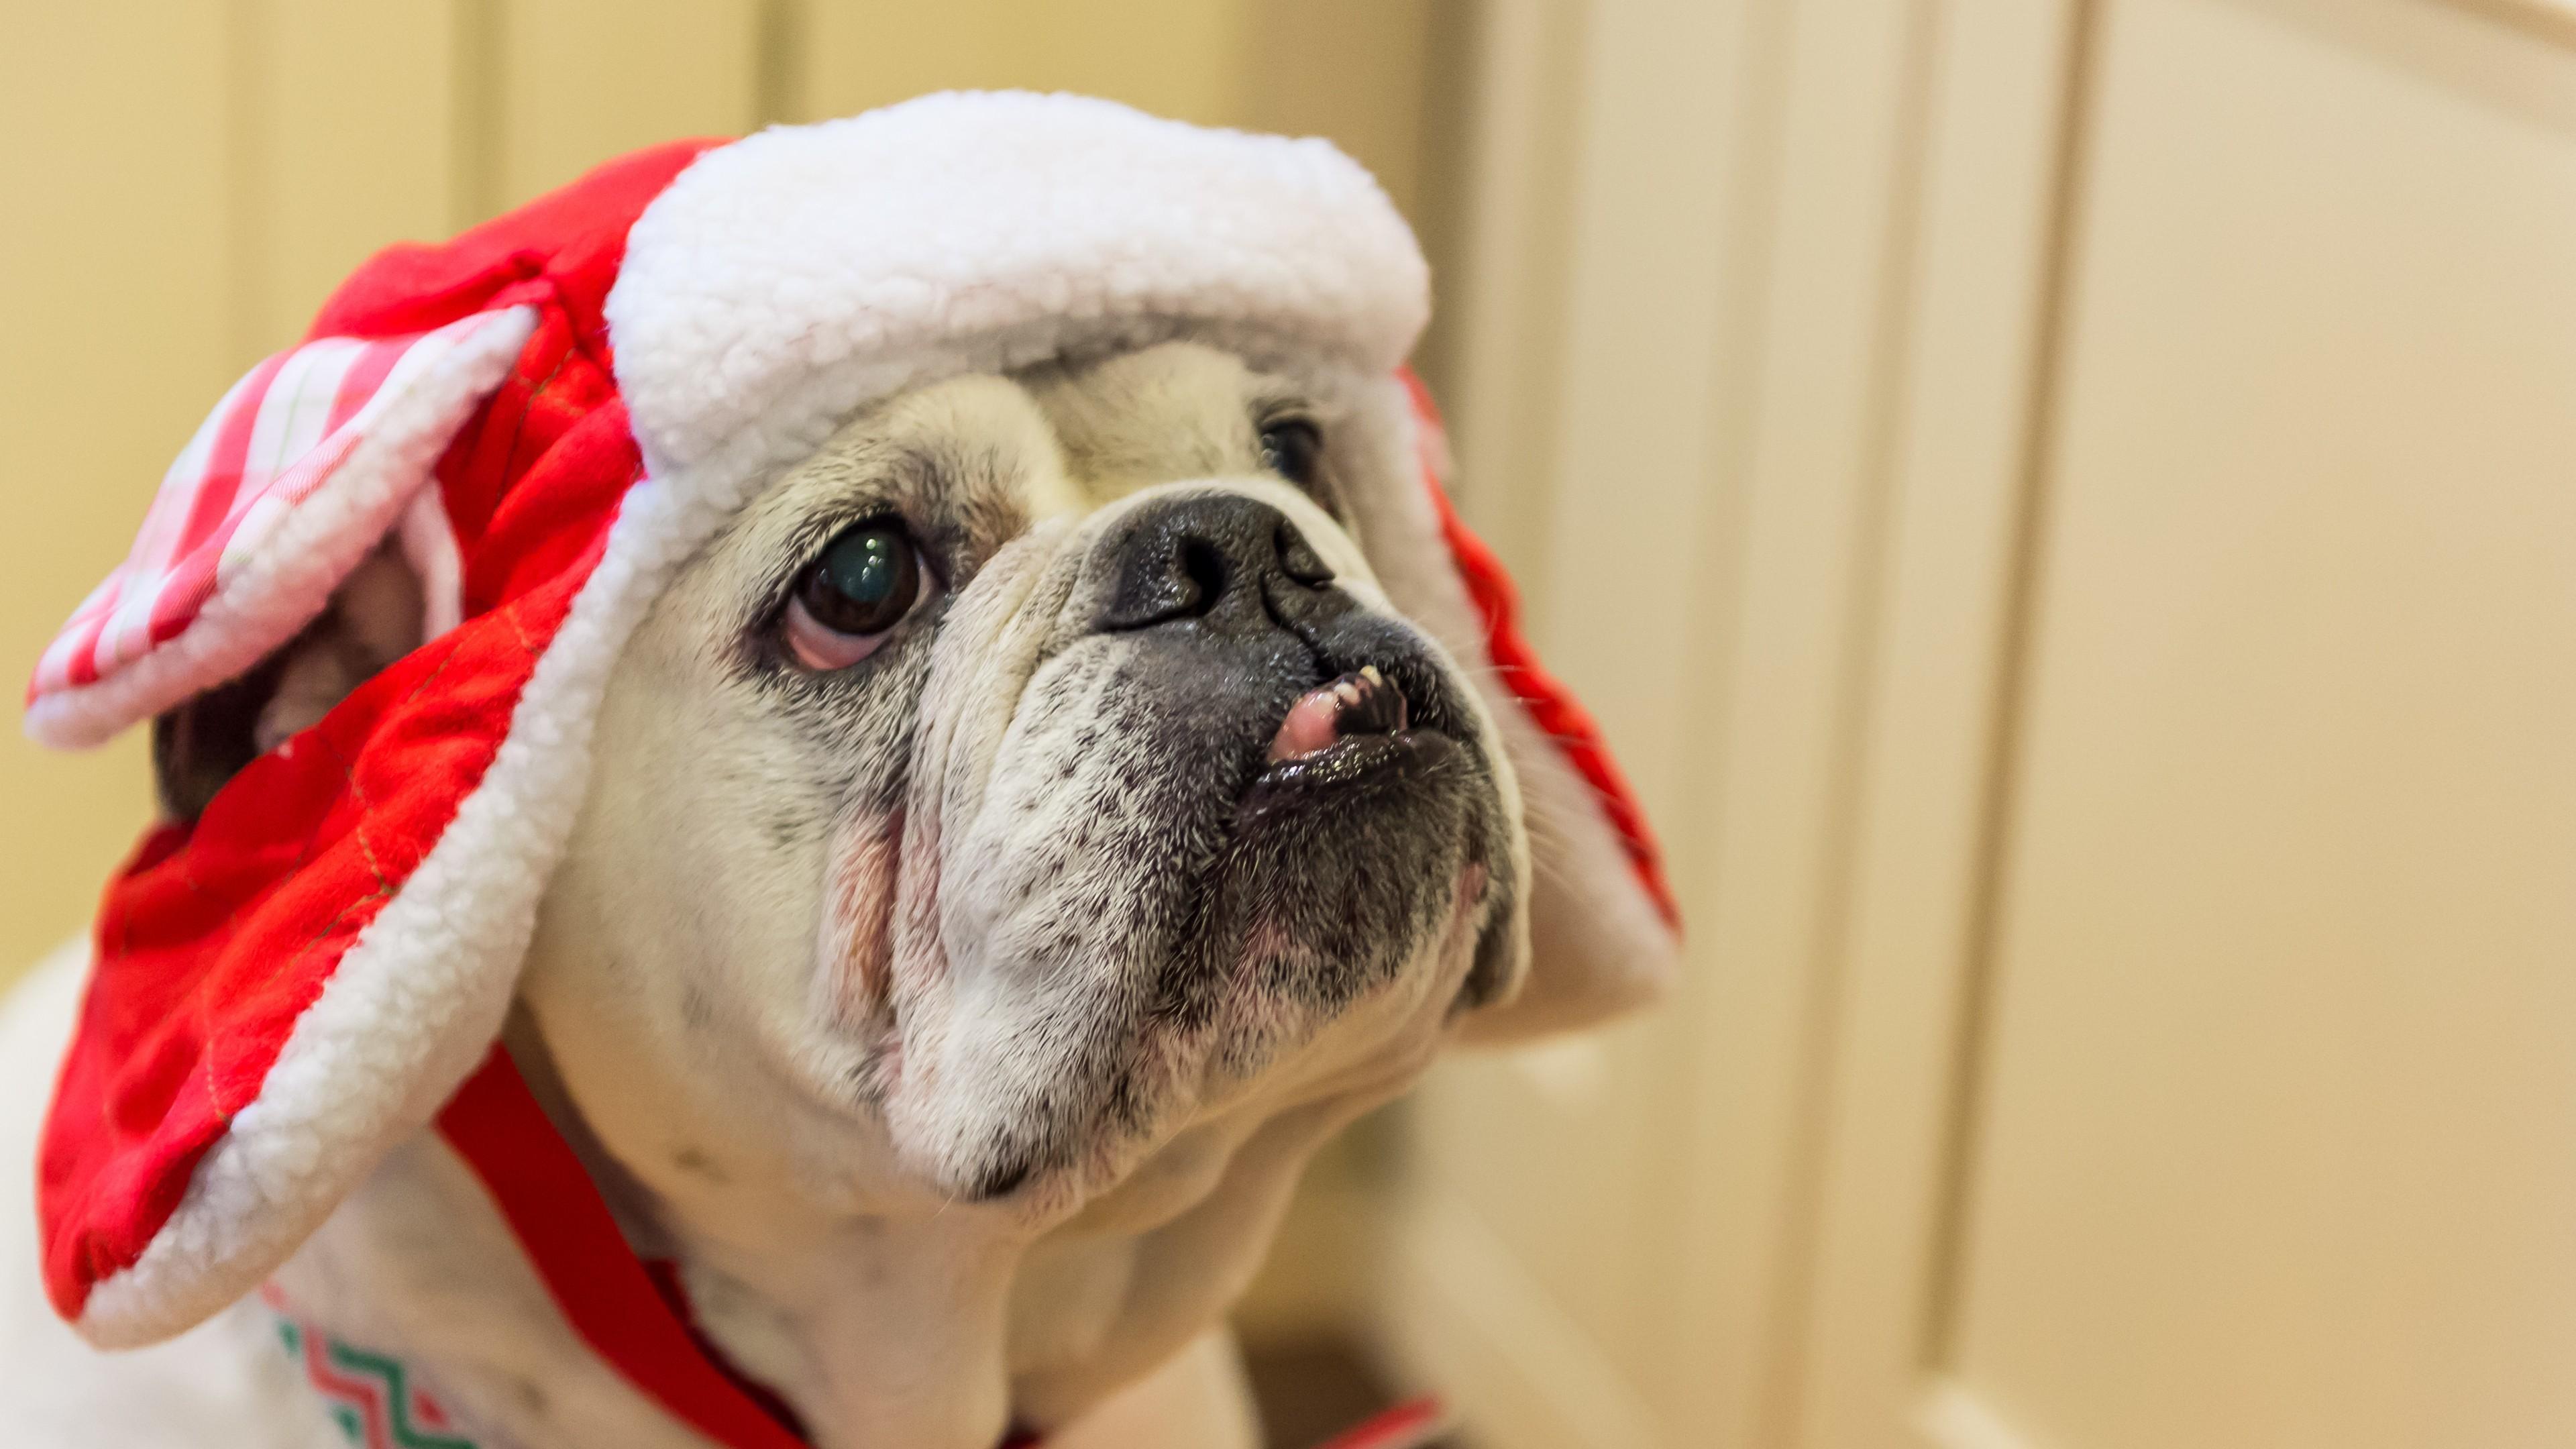 Bulldog in hat wallpaper